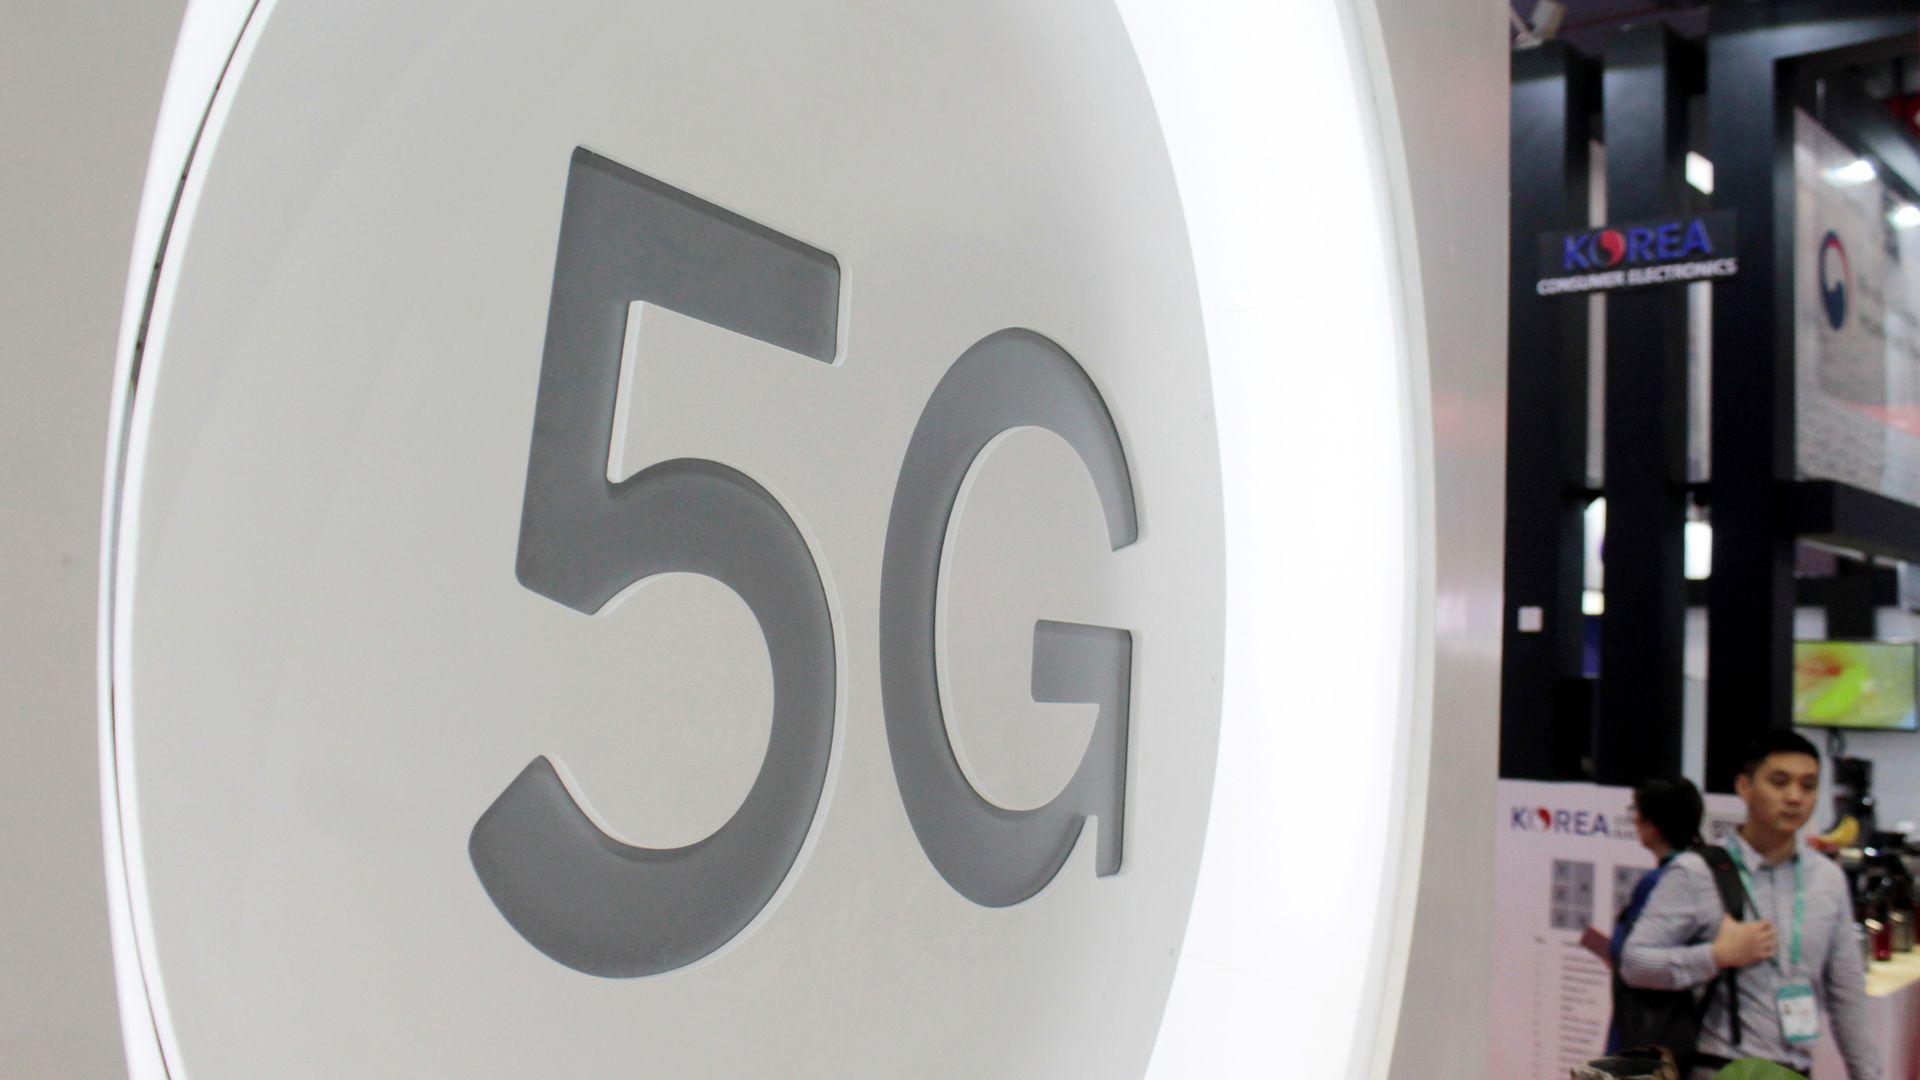 5G symbol.